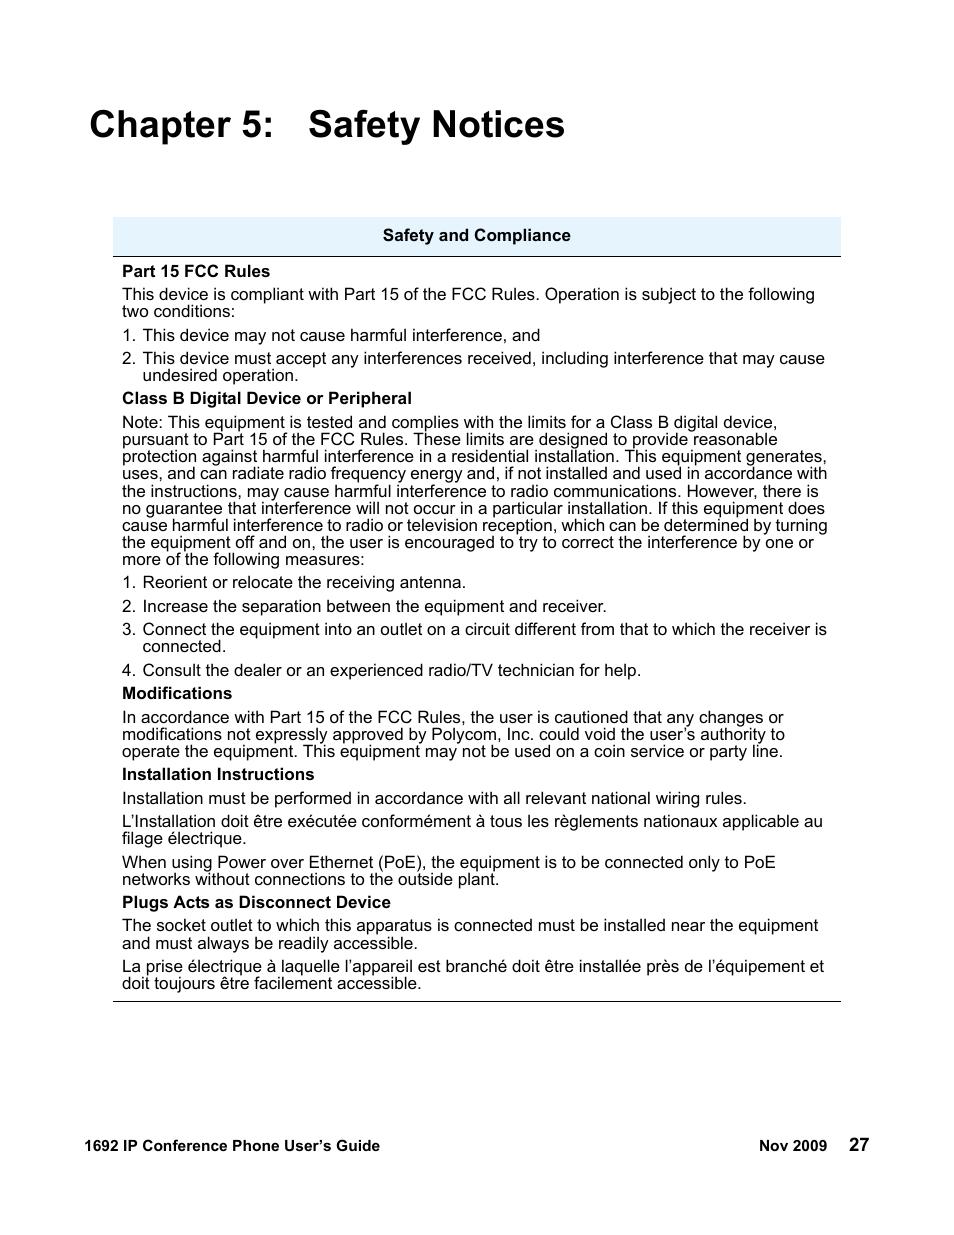 chapter 5 safety notices avaya 1692 ip user manual page 27 32 rh manualsdir com avaya 1692 ip conference phone user guide avaya 1692 conference phone user guide